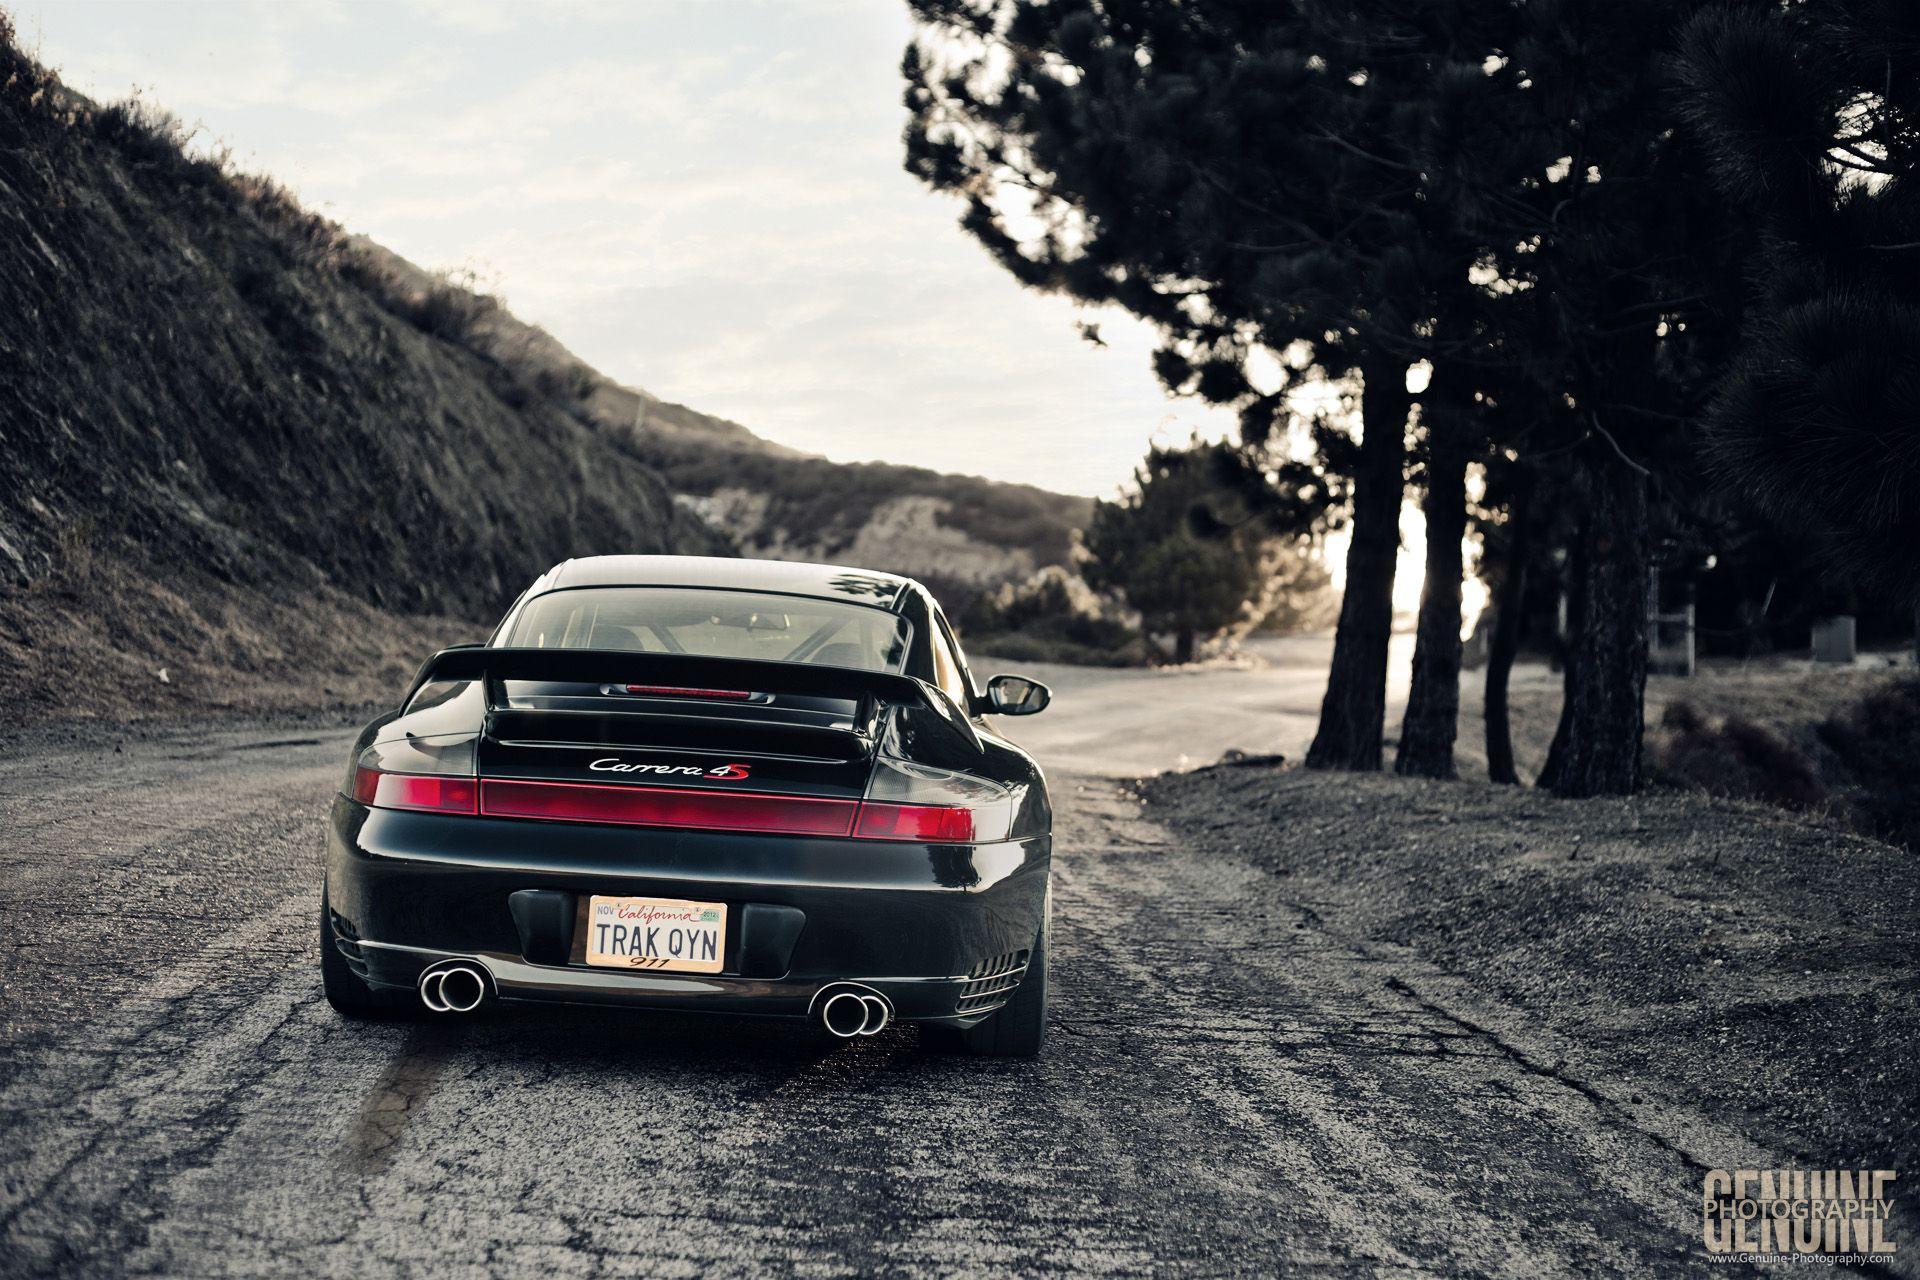 Cars, racing & sports cars HD Desktop Wallpapers, Instagram photos, Background Images - AmazingPict.com